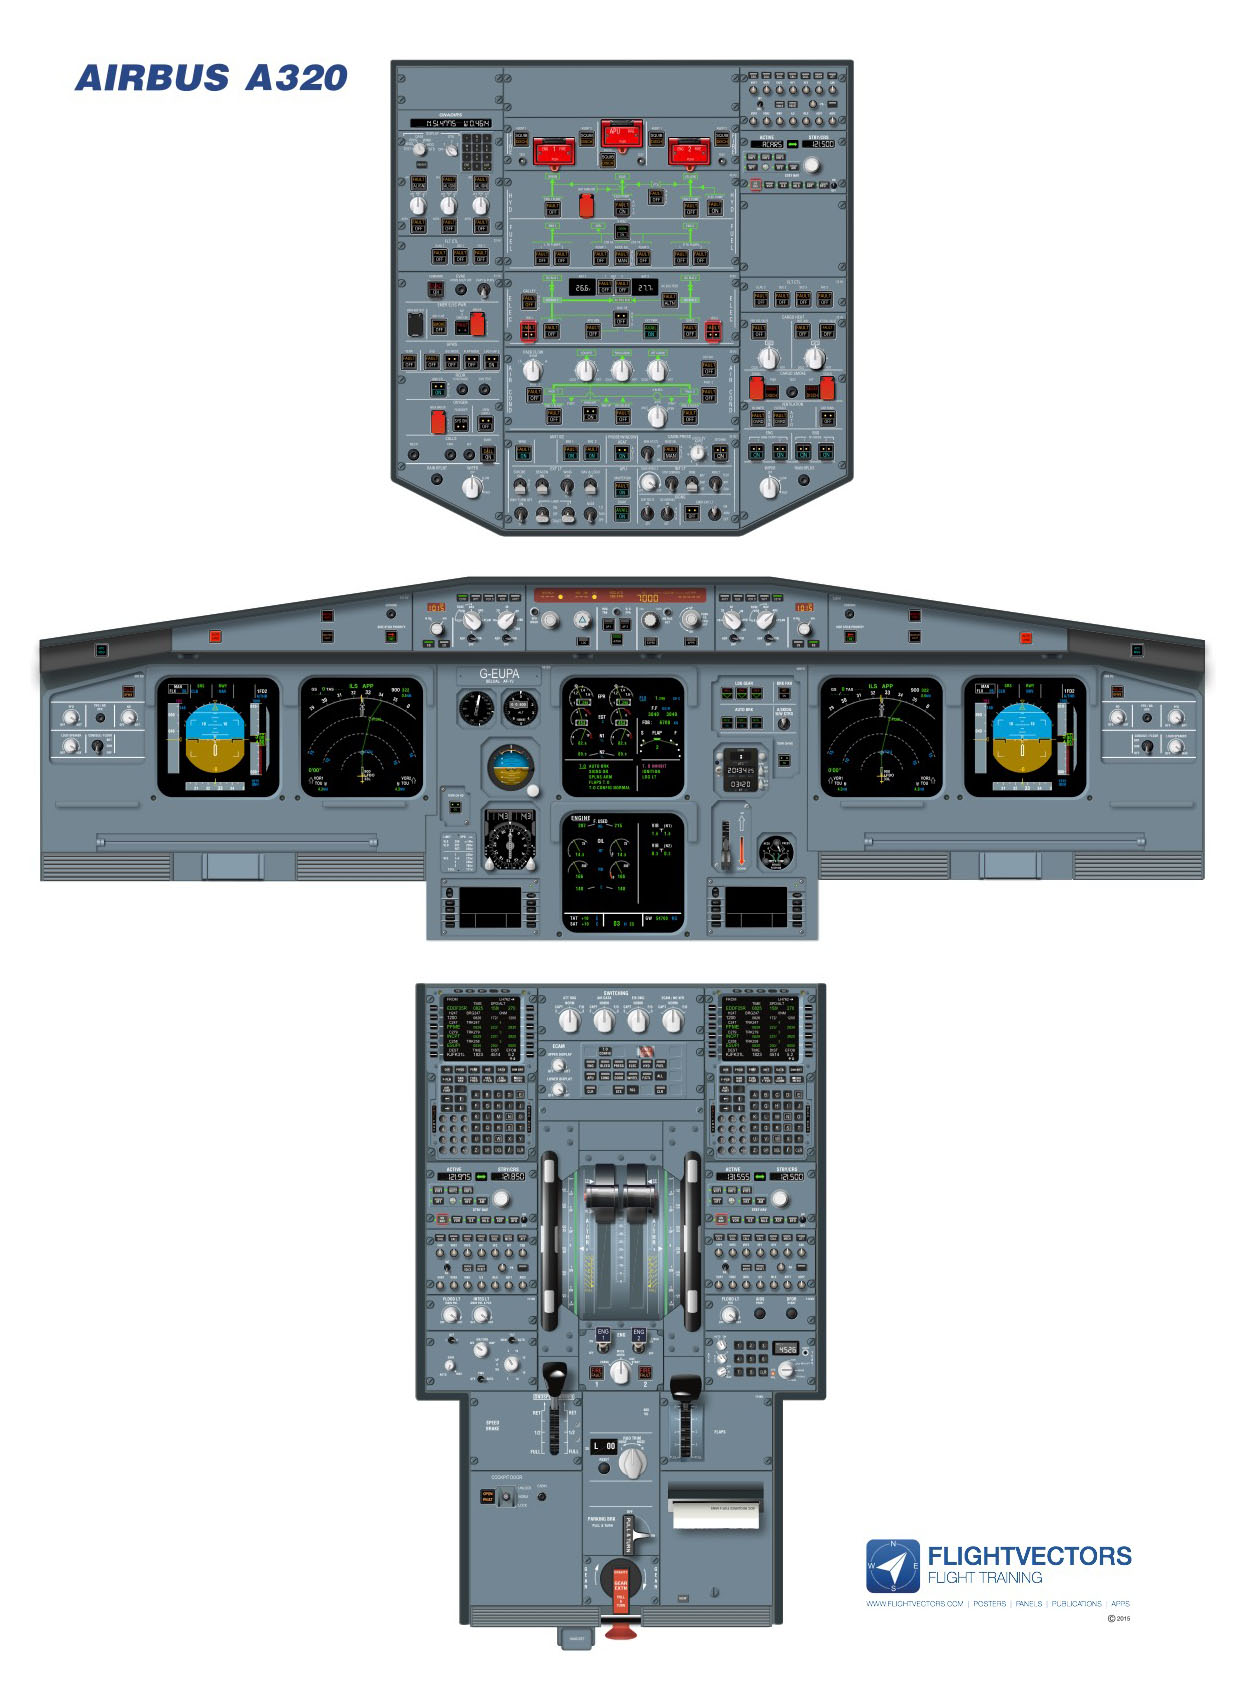 400 800 Hd Wallpaper Flightvectors Online Store